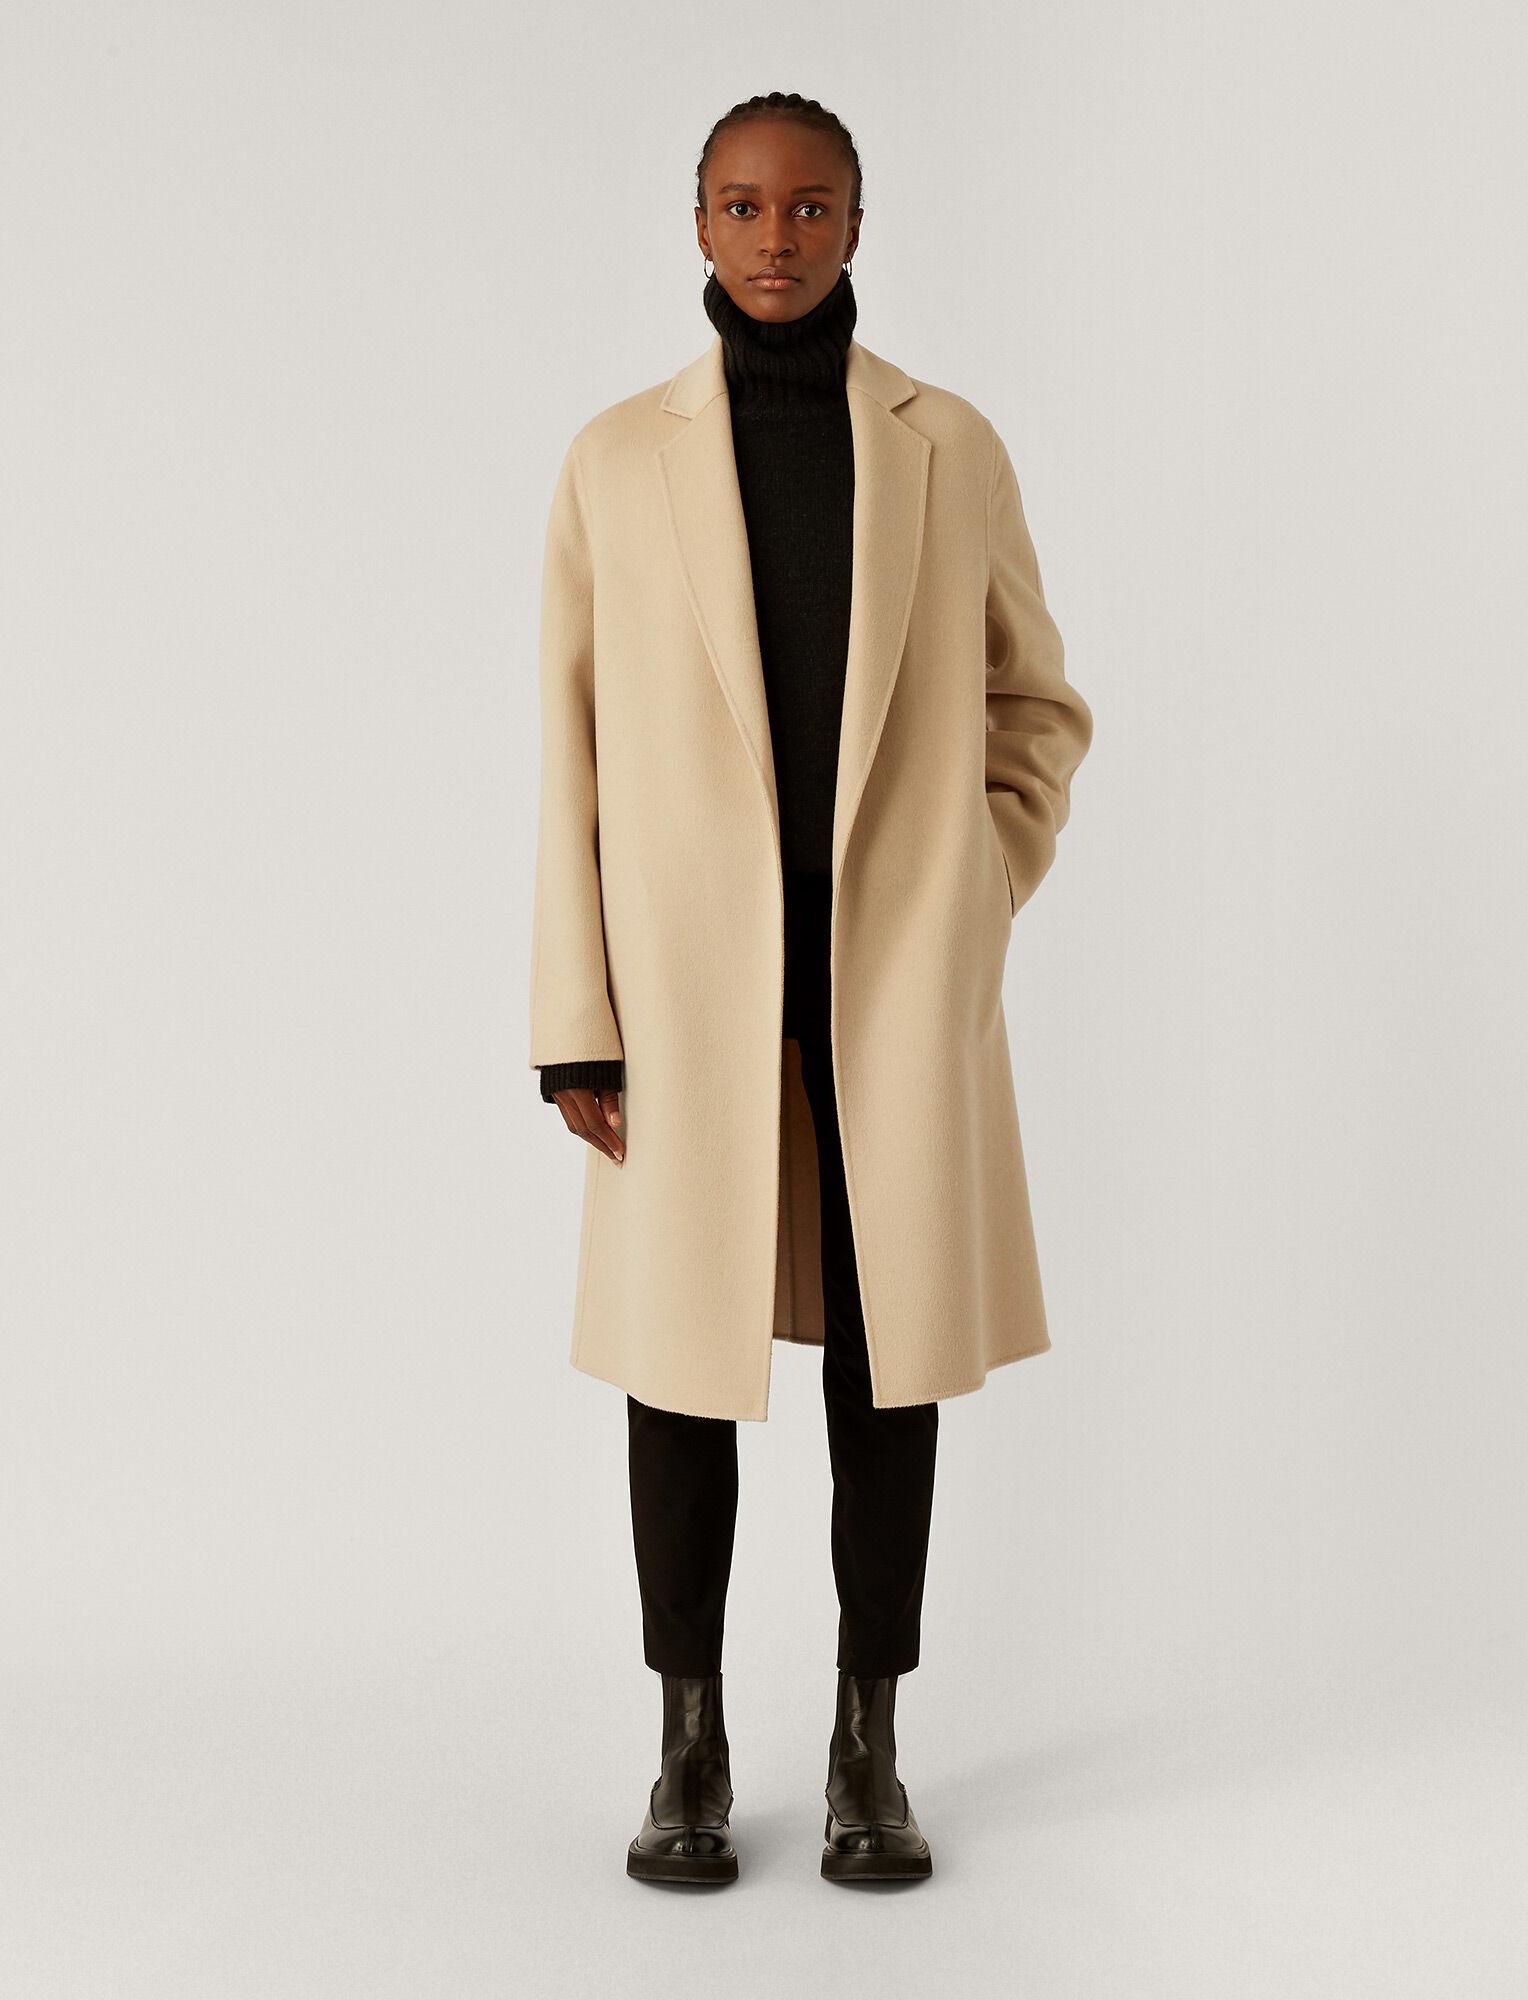 Joseph, Double Face Cashmere Cenda Long Coat, in CHAMPAGNE